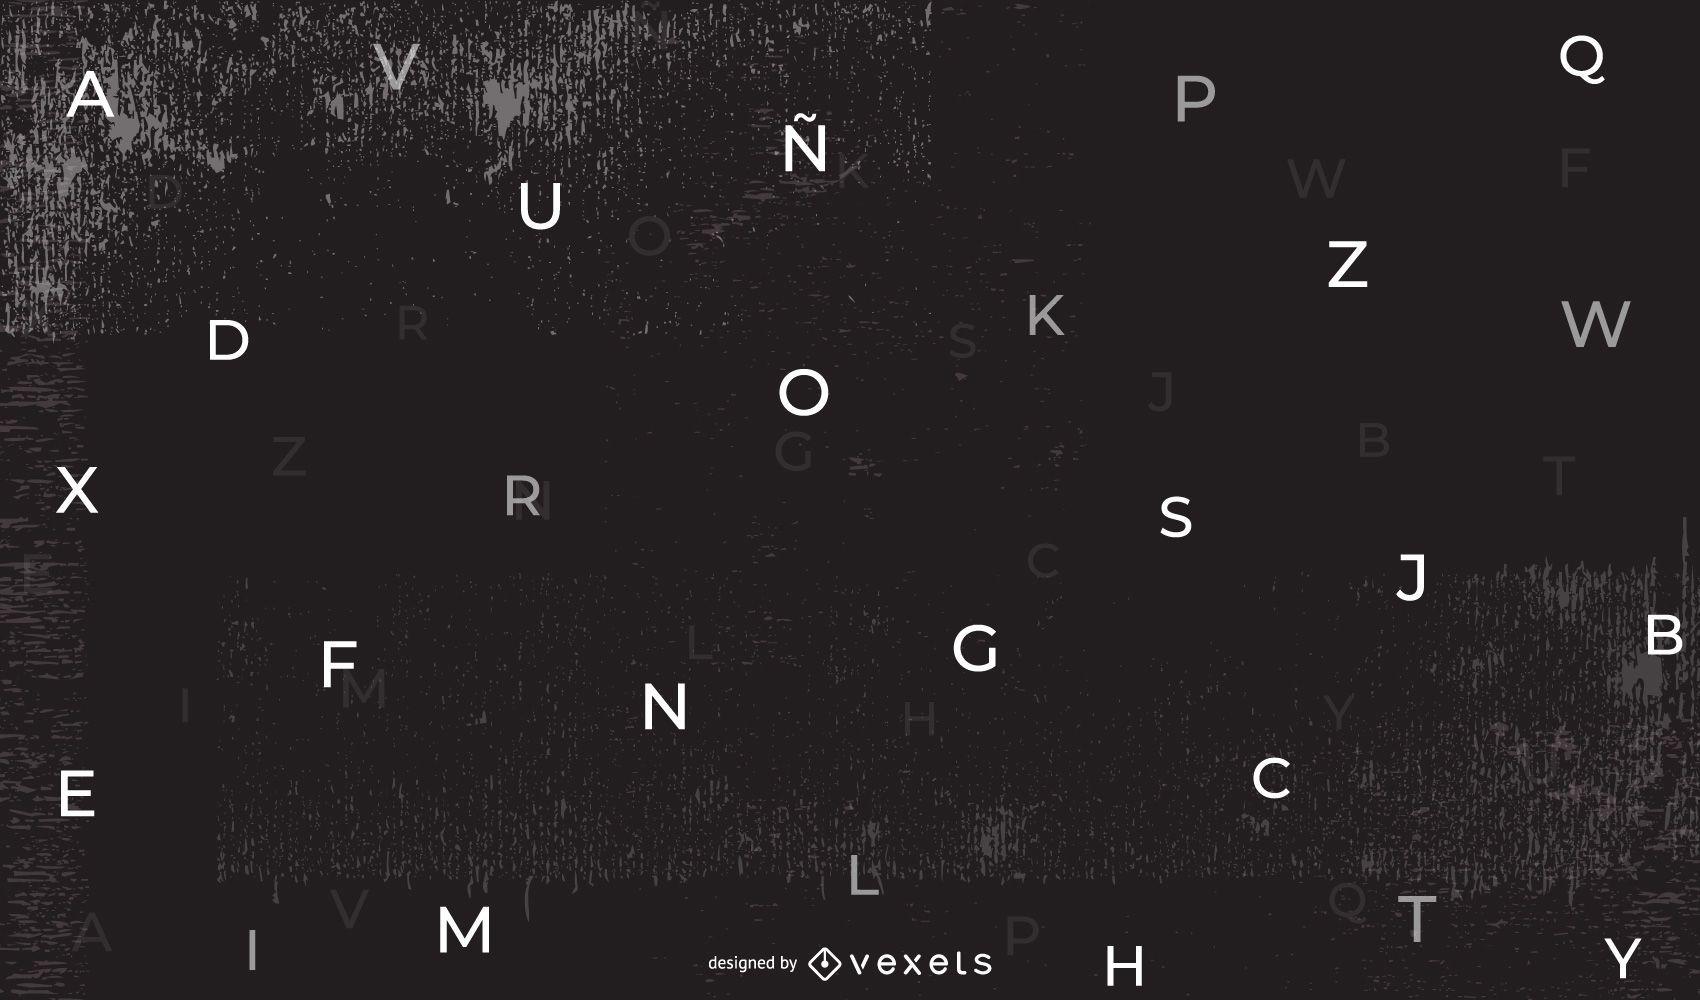 Dark Abstract Alphabetic Background